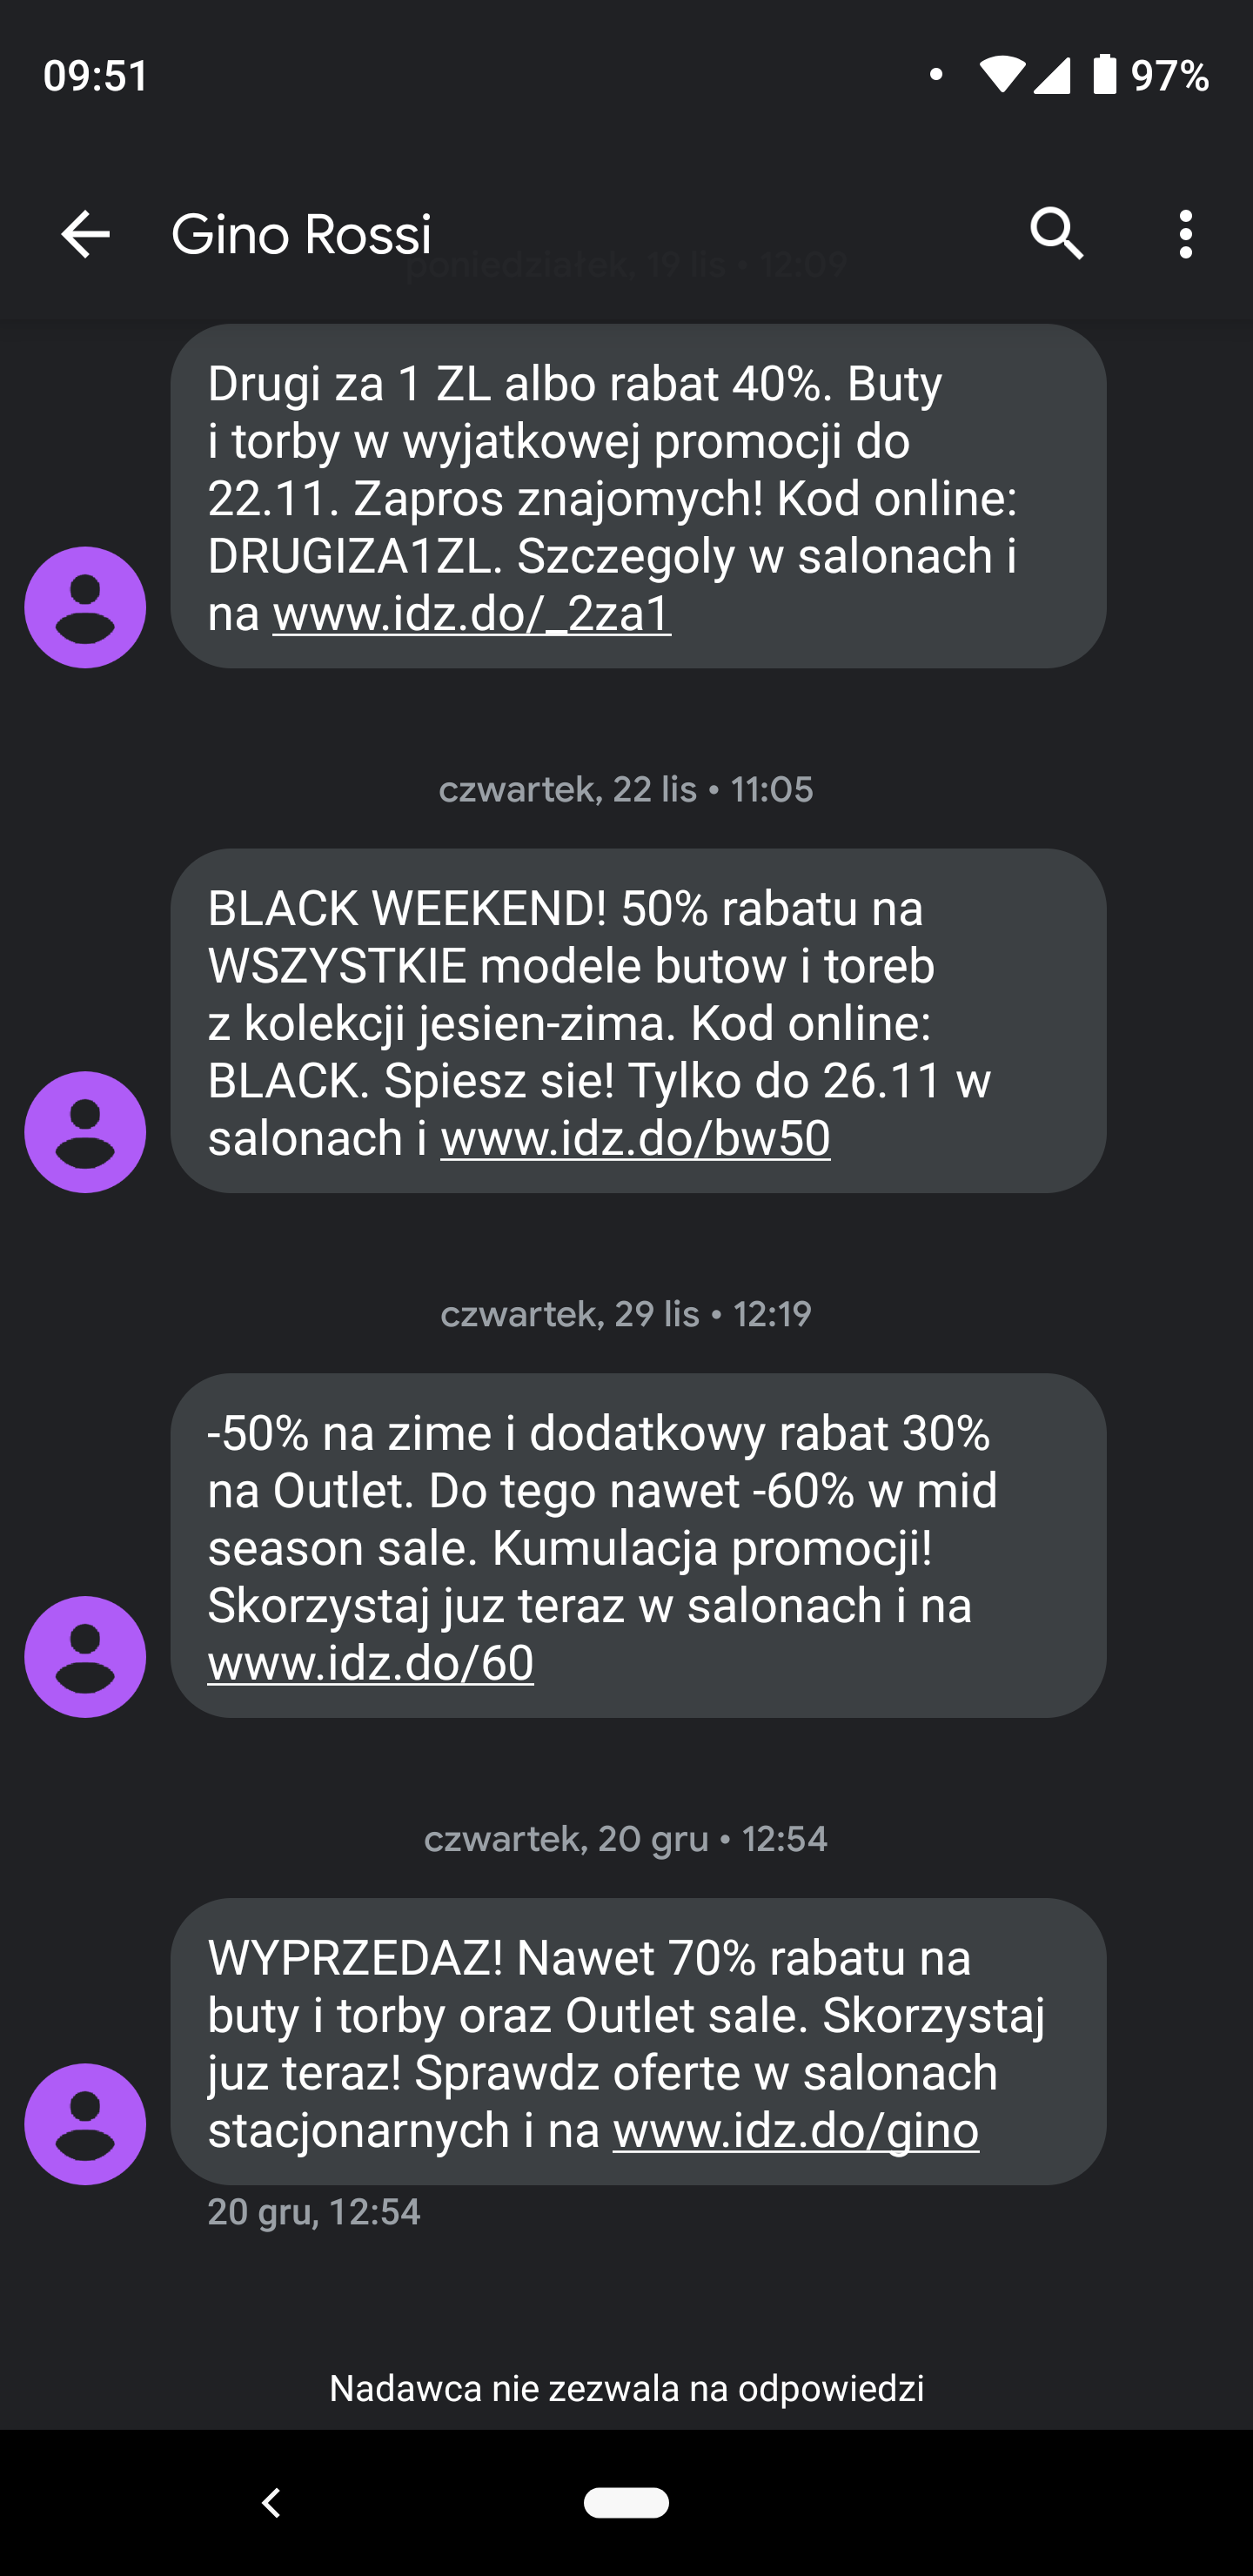 sms w e-commerce Gino Rossi przykład